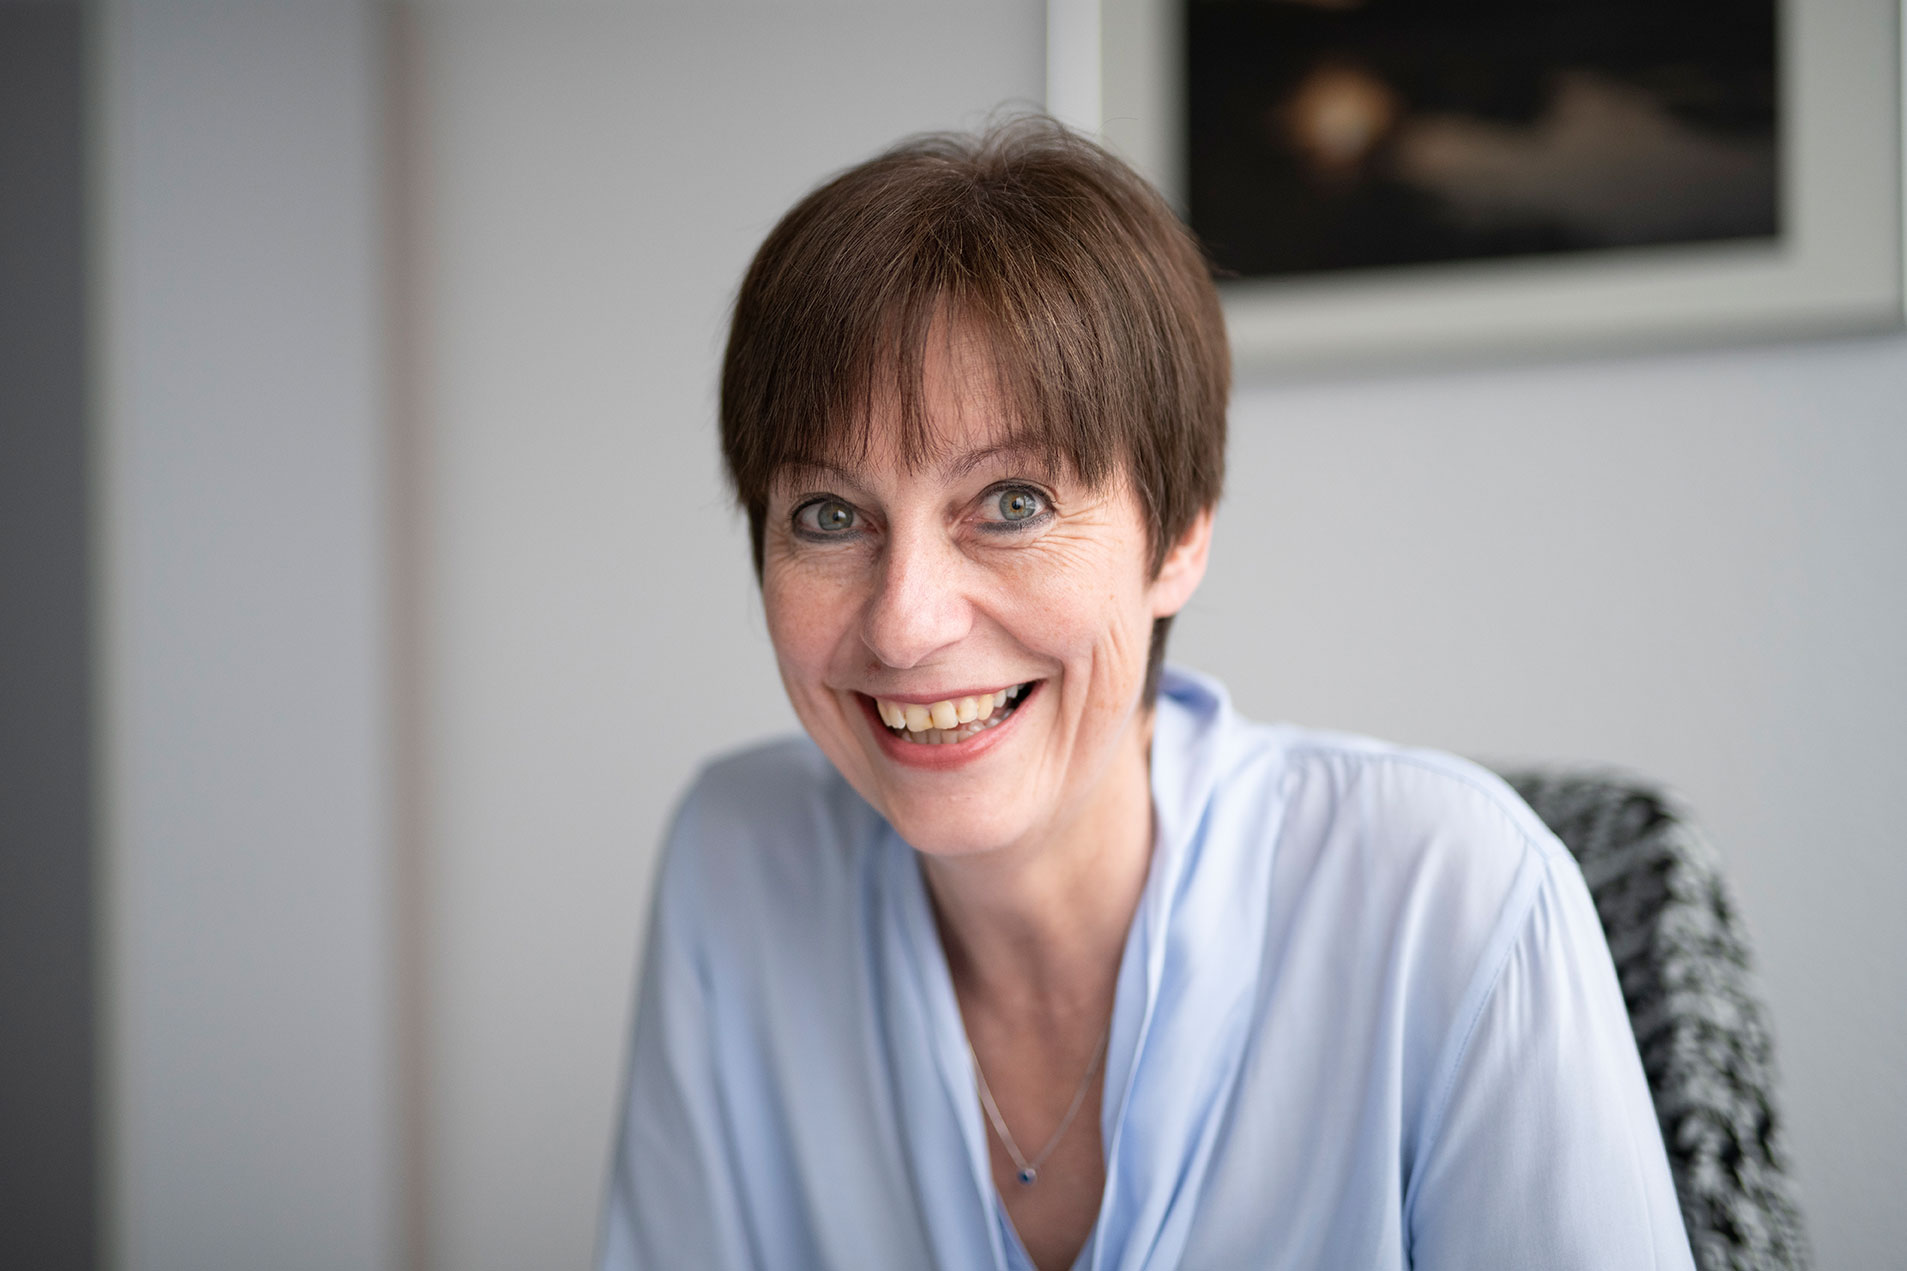 Sabine Meusel